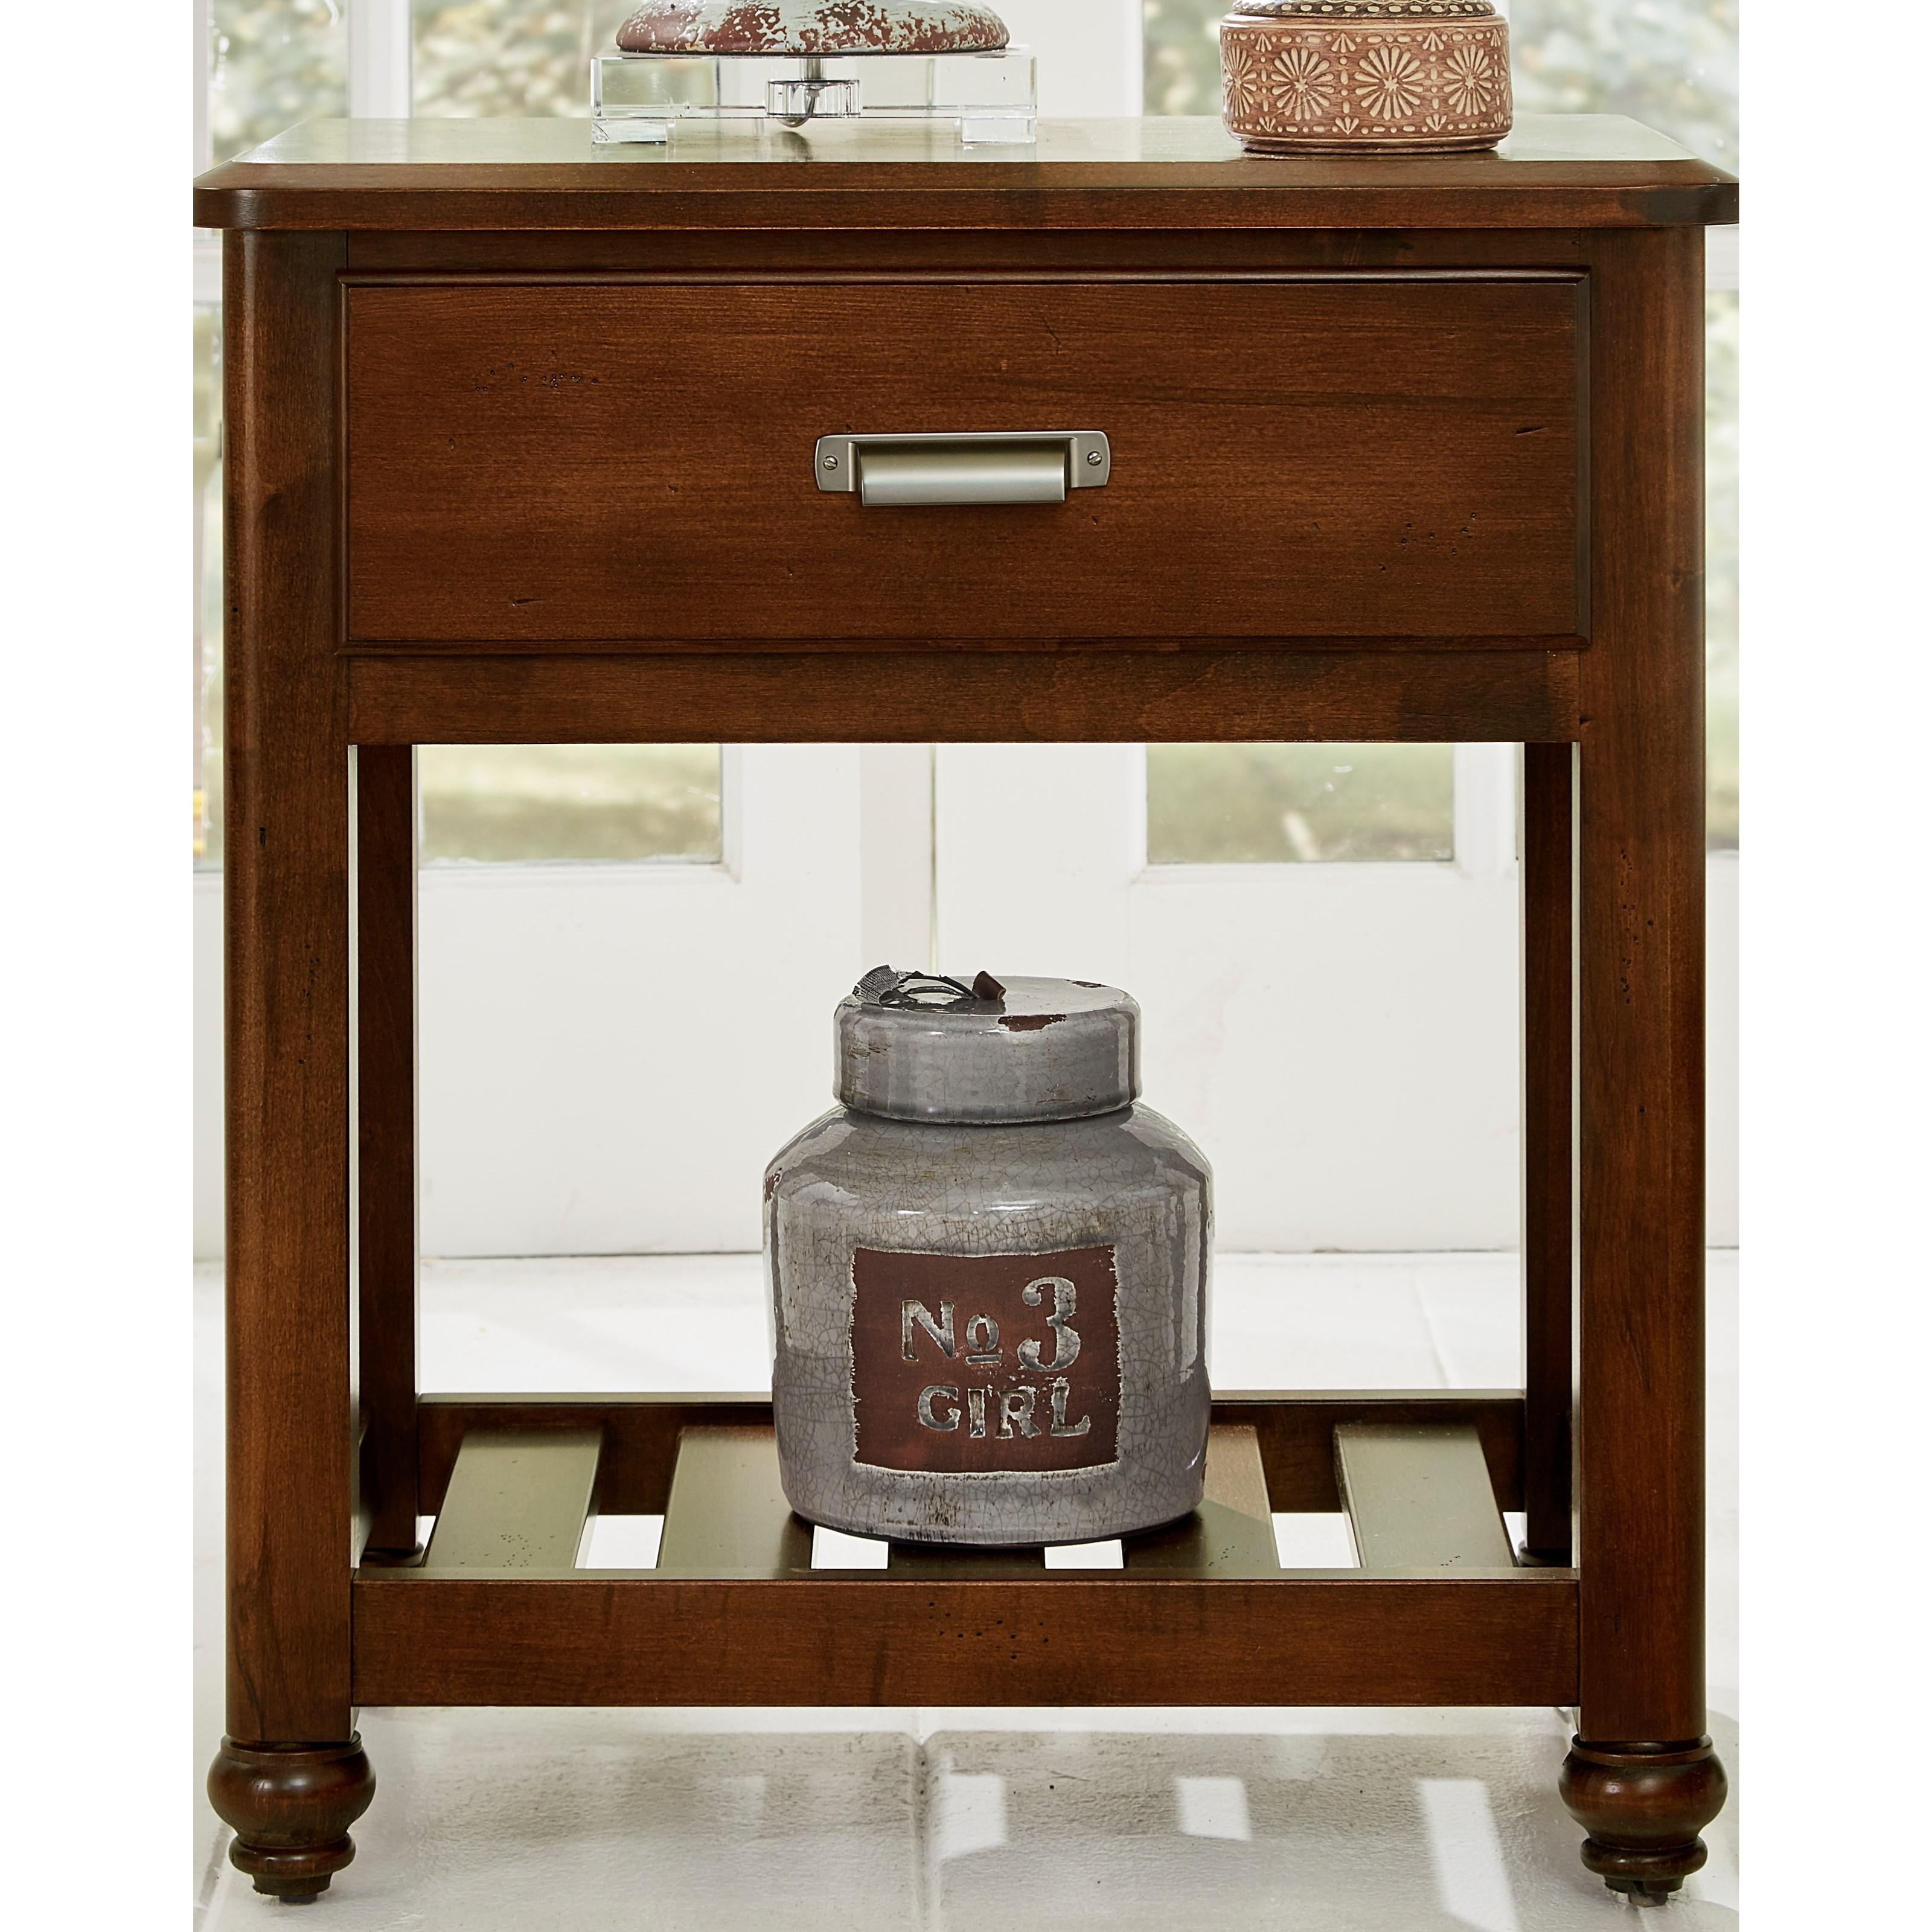 Bassett Furniture Milford Ct: Vaughan Bassett American Maple 400-226 Solid Wood Night